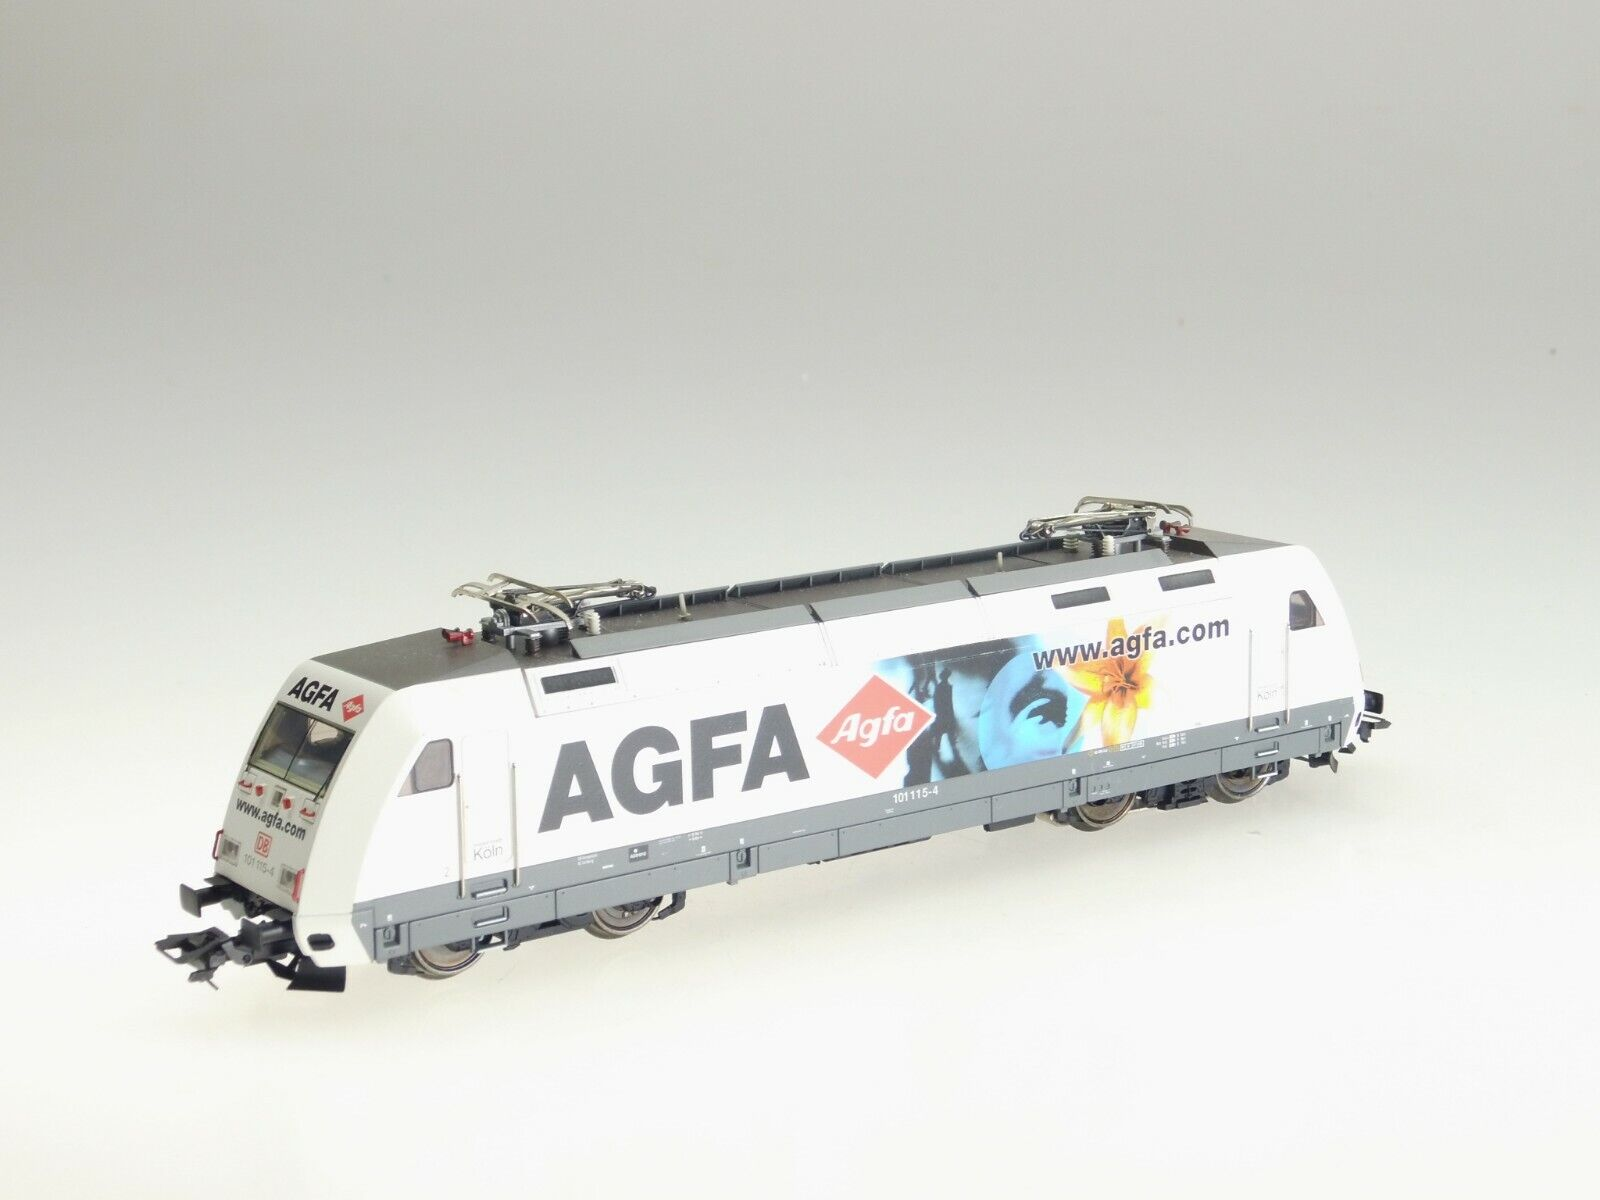 (87 477) marklin H0 E-Lok 101 115-4   Agfa   DB (Tipo Nr.29856) AC   Digitale